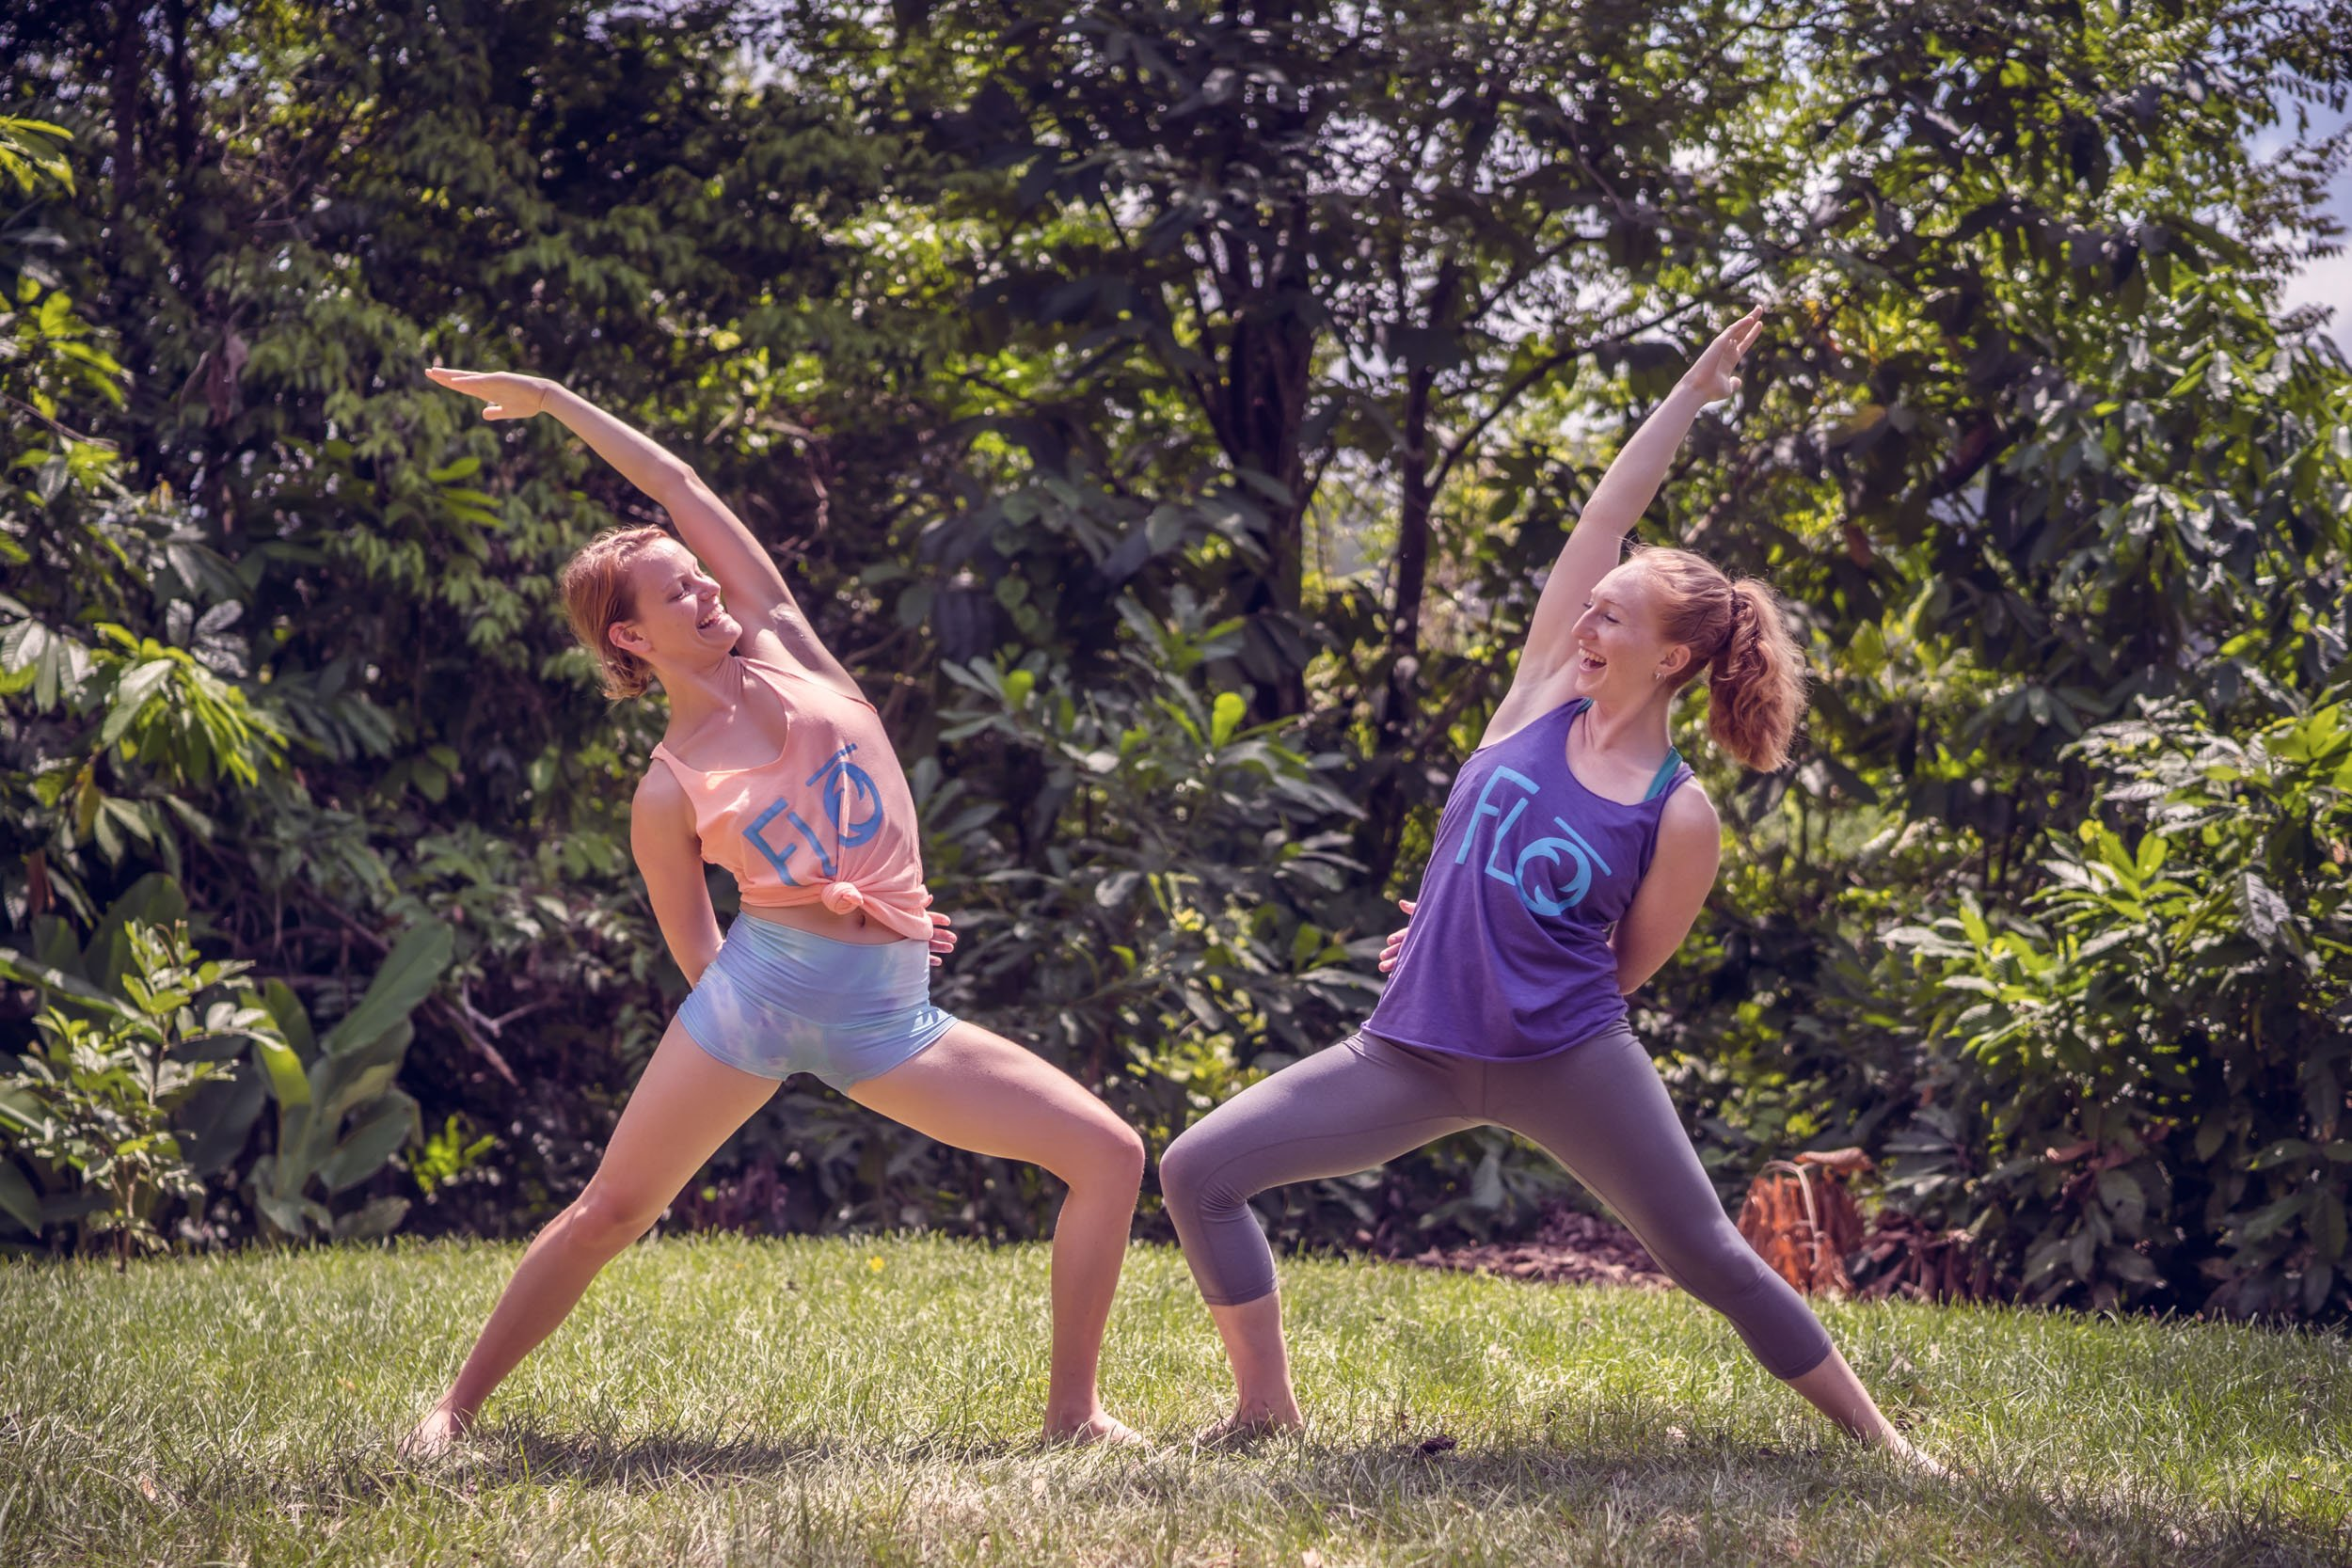 jodie-louise-yoga-photographer-retreats-workshops-spiritual-15